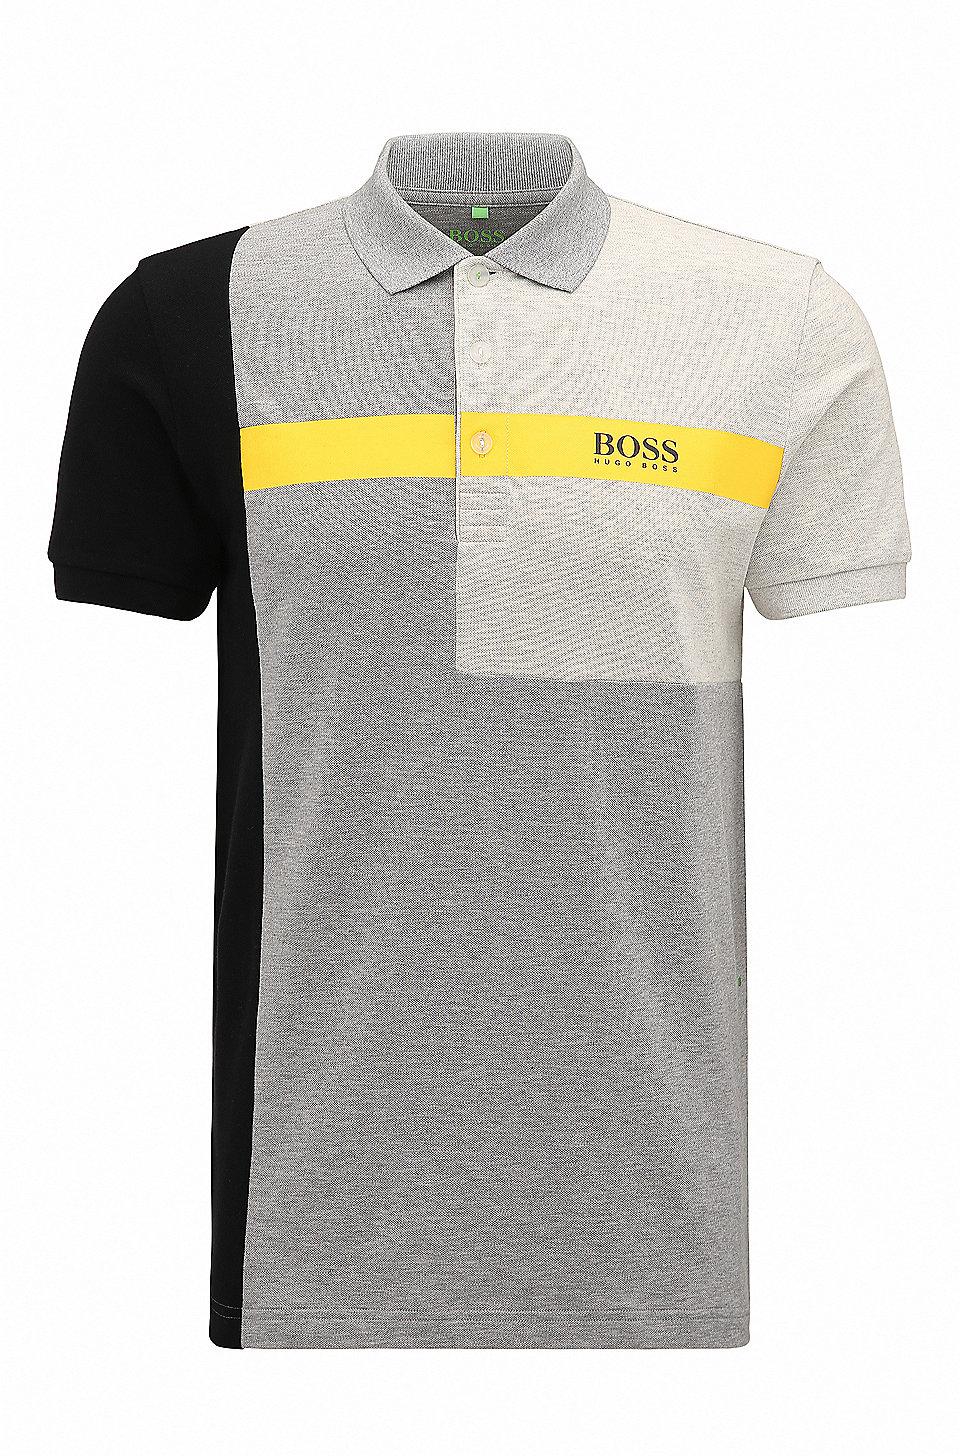 8dbabe5e7 Hugo Boss Golf Polo Shirts Sale   Top Mode Depot